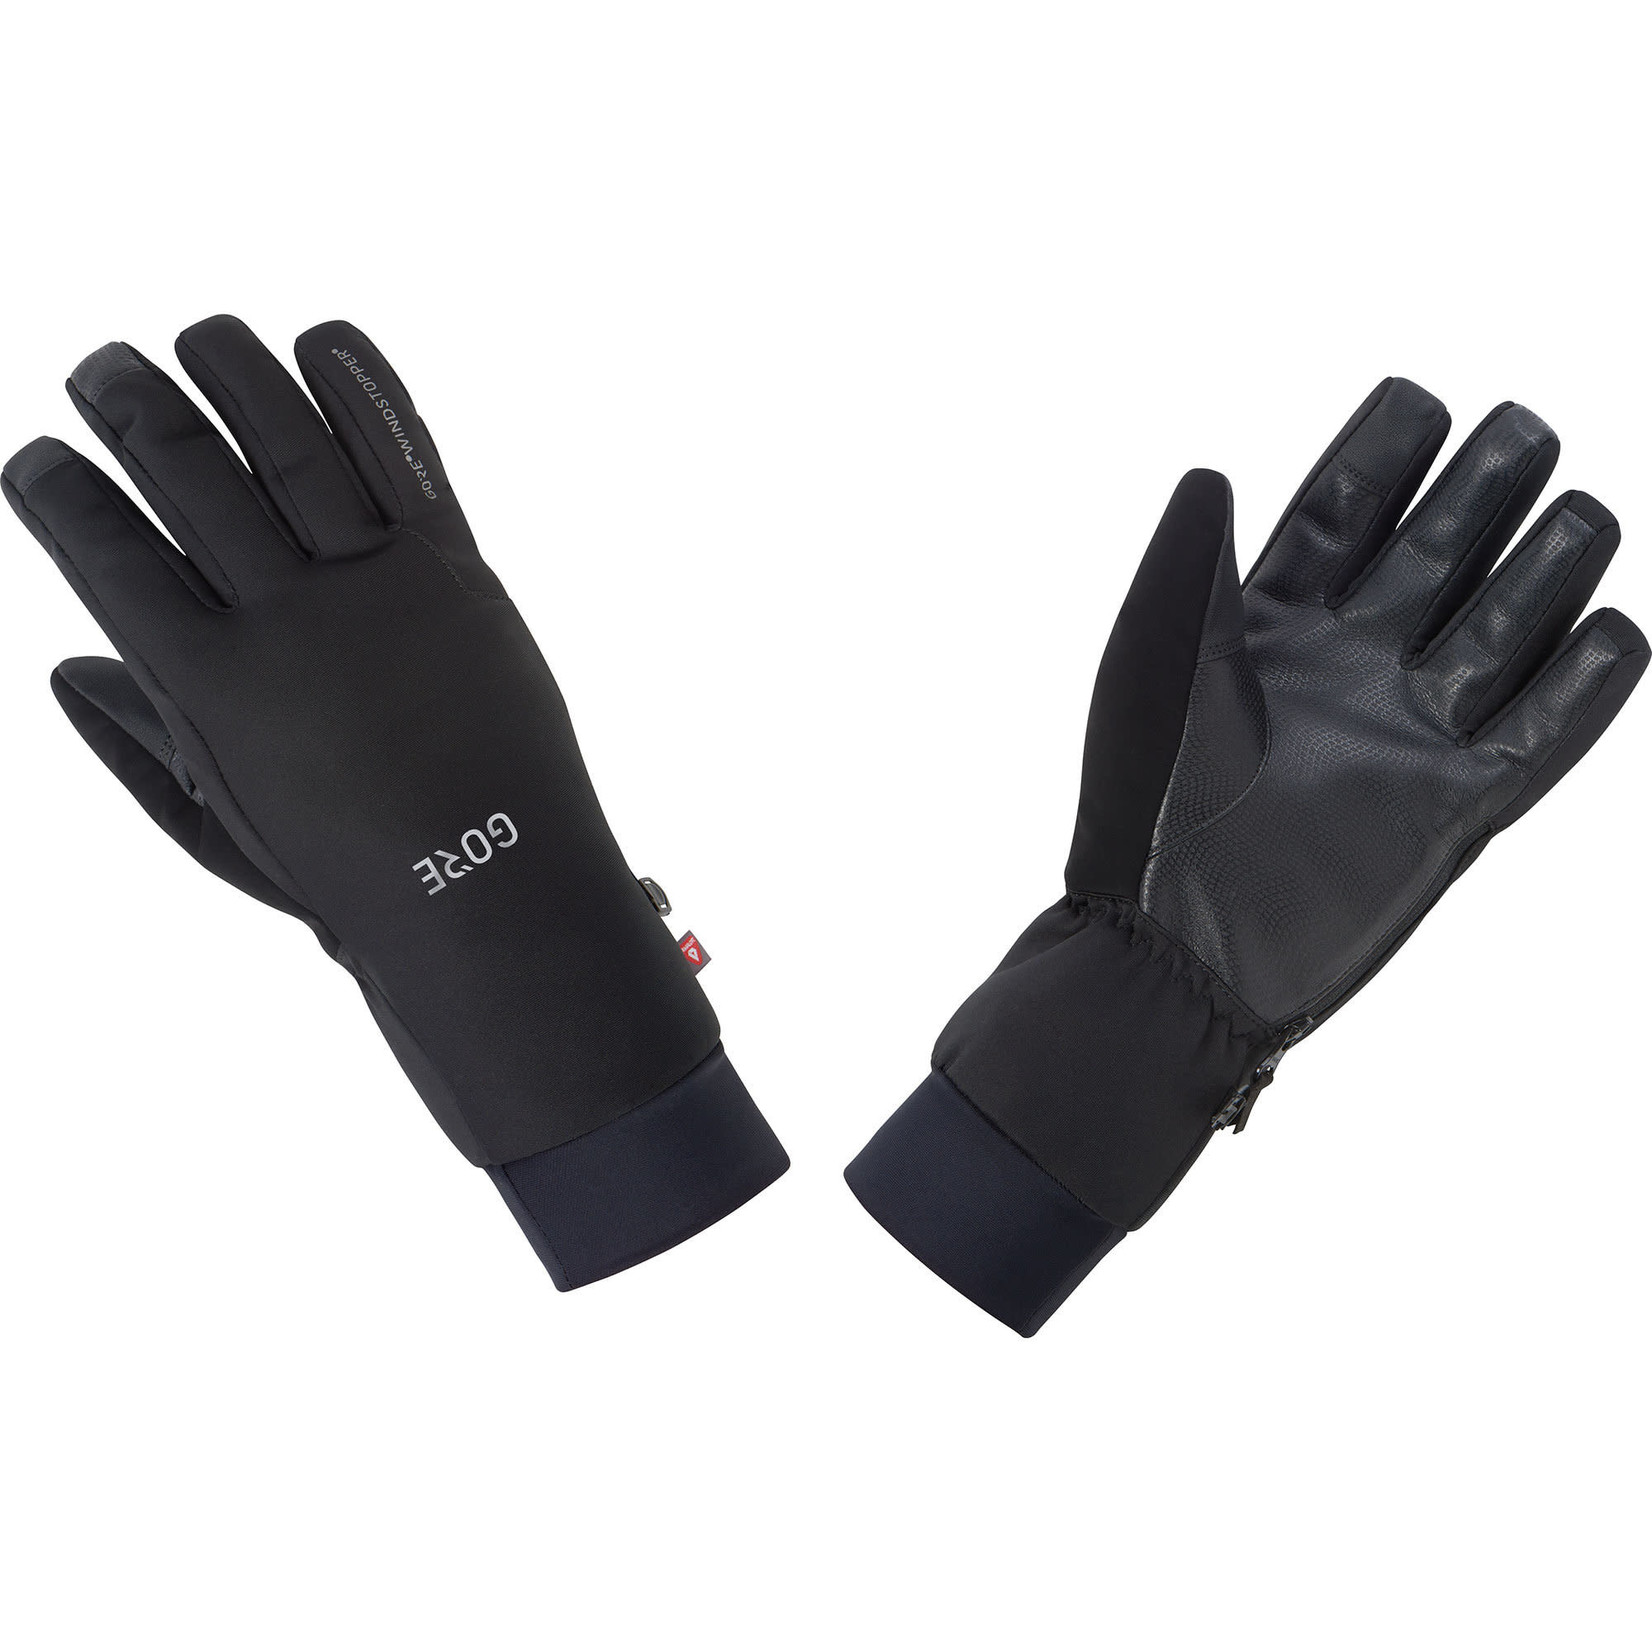 GORE Wear GORE WINDSTOPPER Insulated Gloves black 3XL